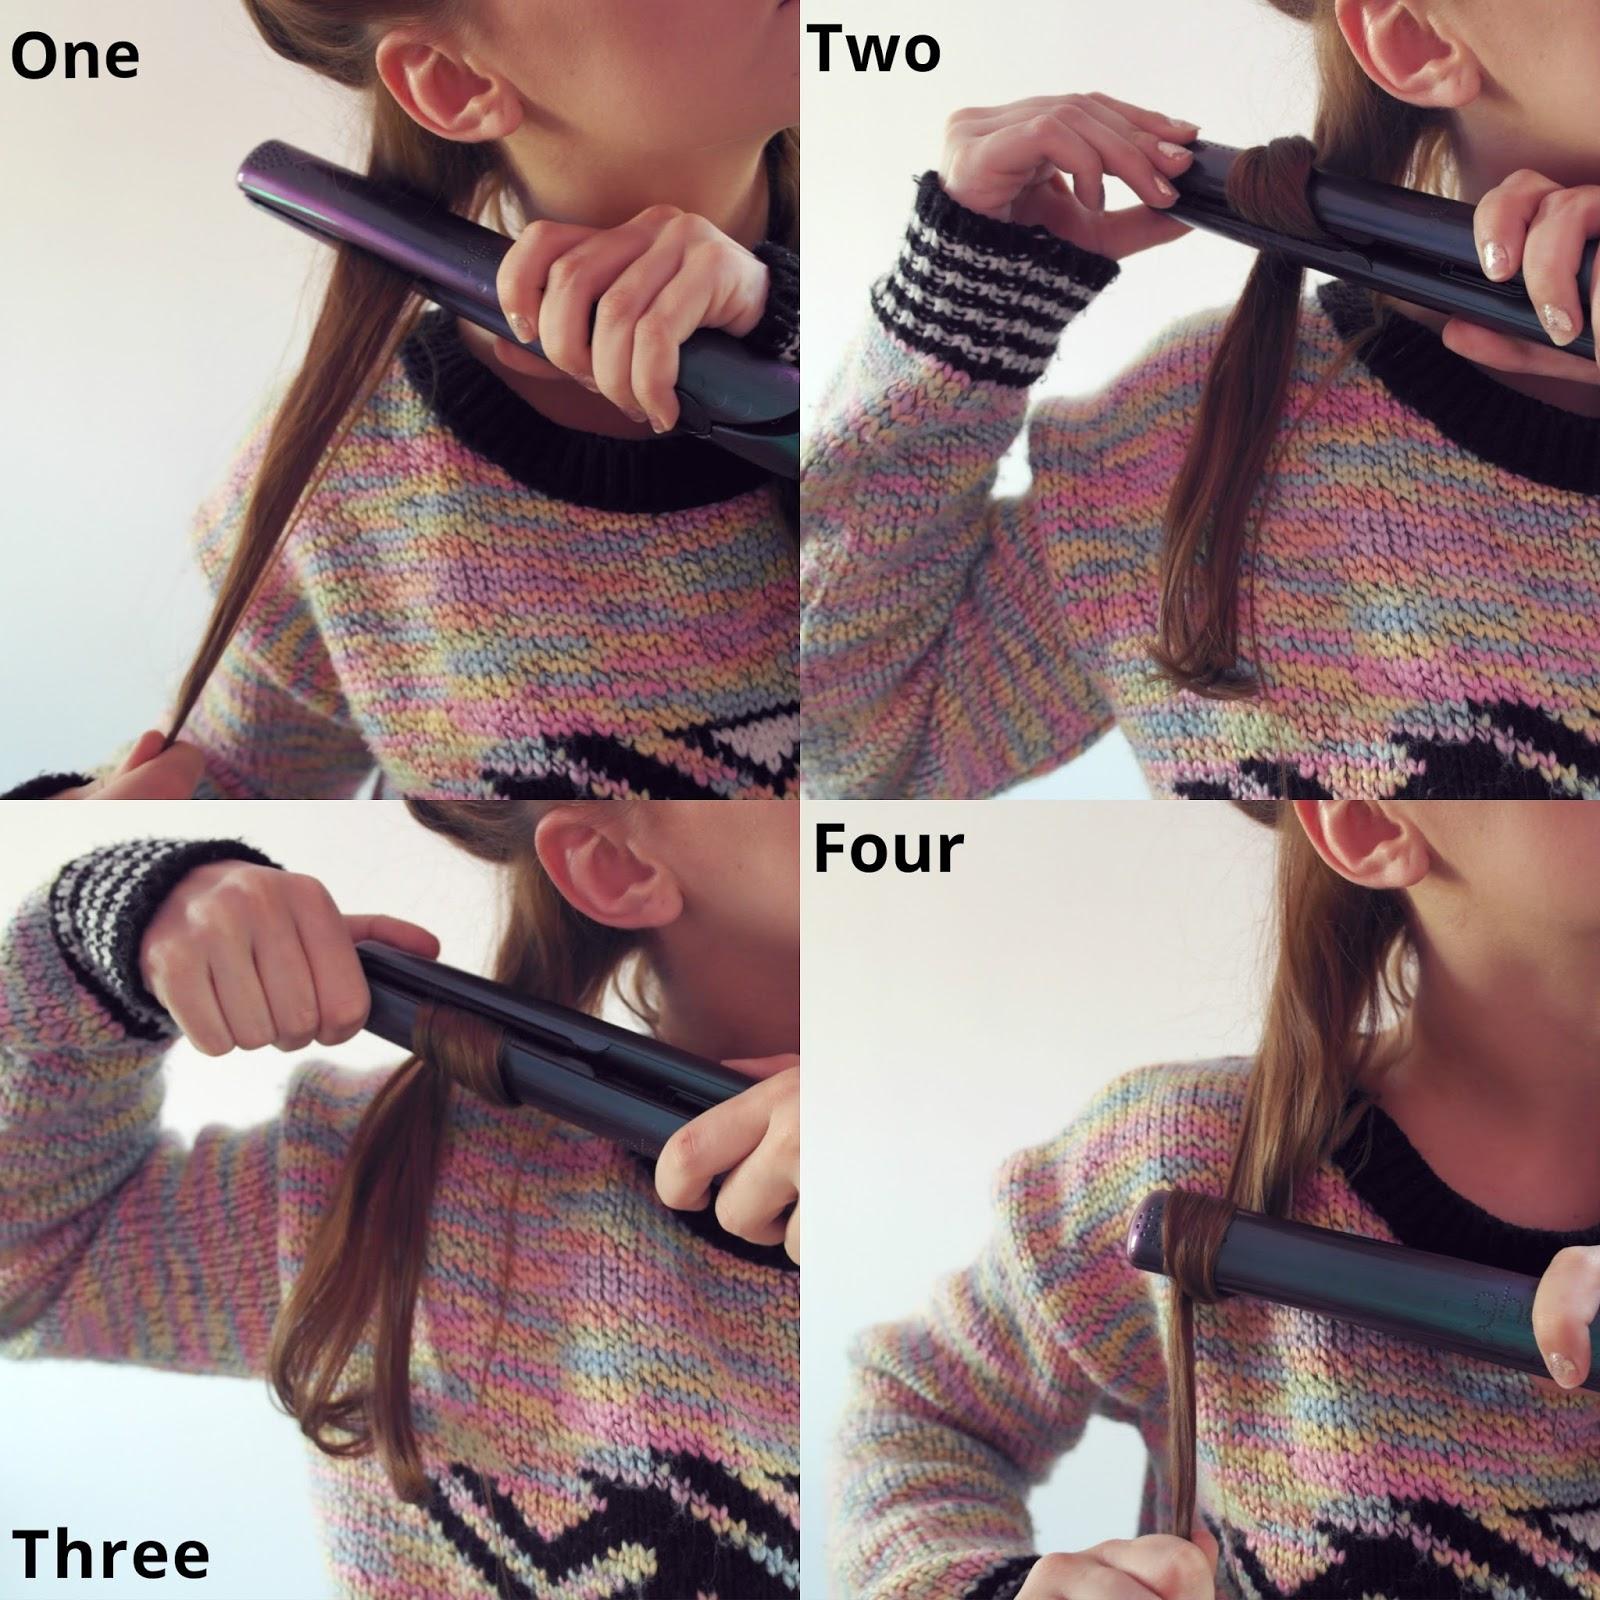 Hair Care Ghd V Wonderland Styler Amp Creating Curls